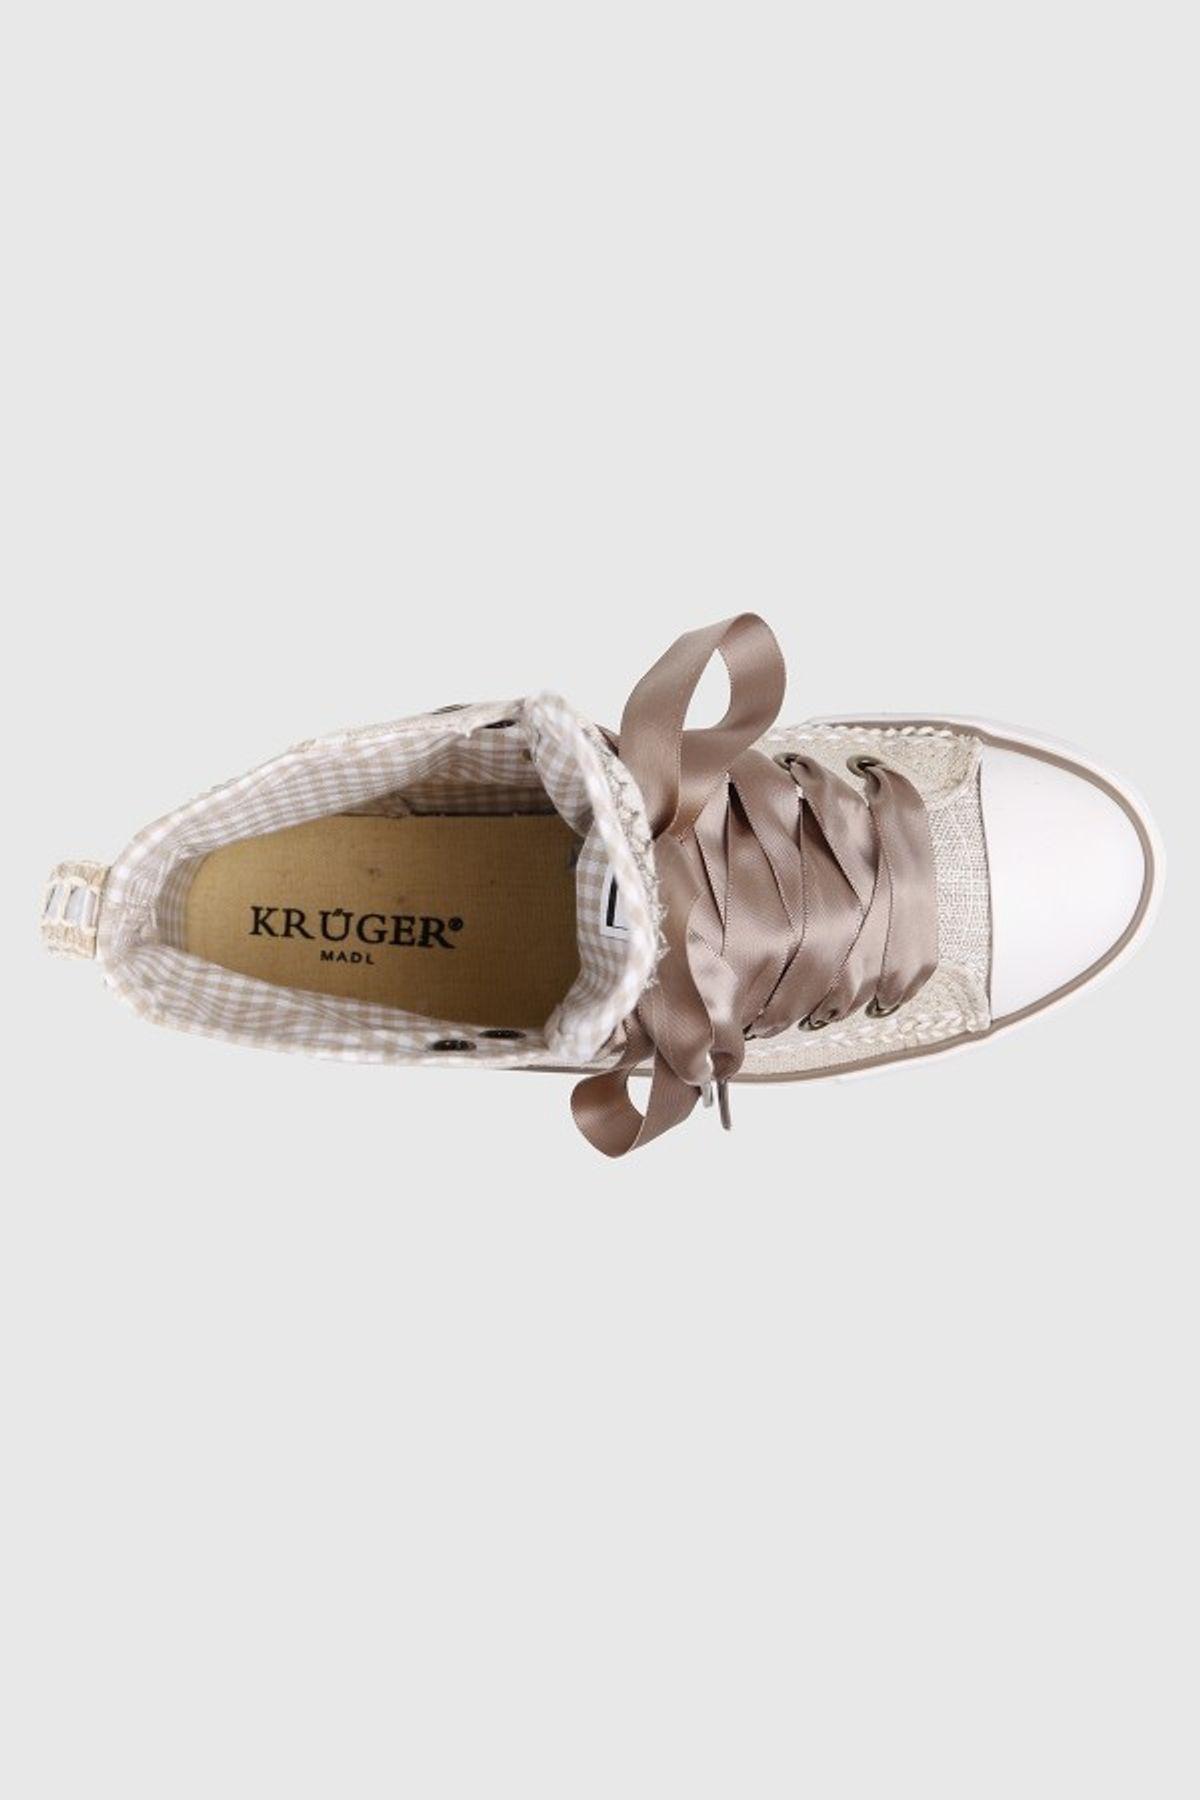 Krüger - Damen Trachtenschuh in natur, Sneaker Countrylove (4433-15) – Bild 4